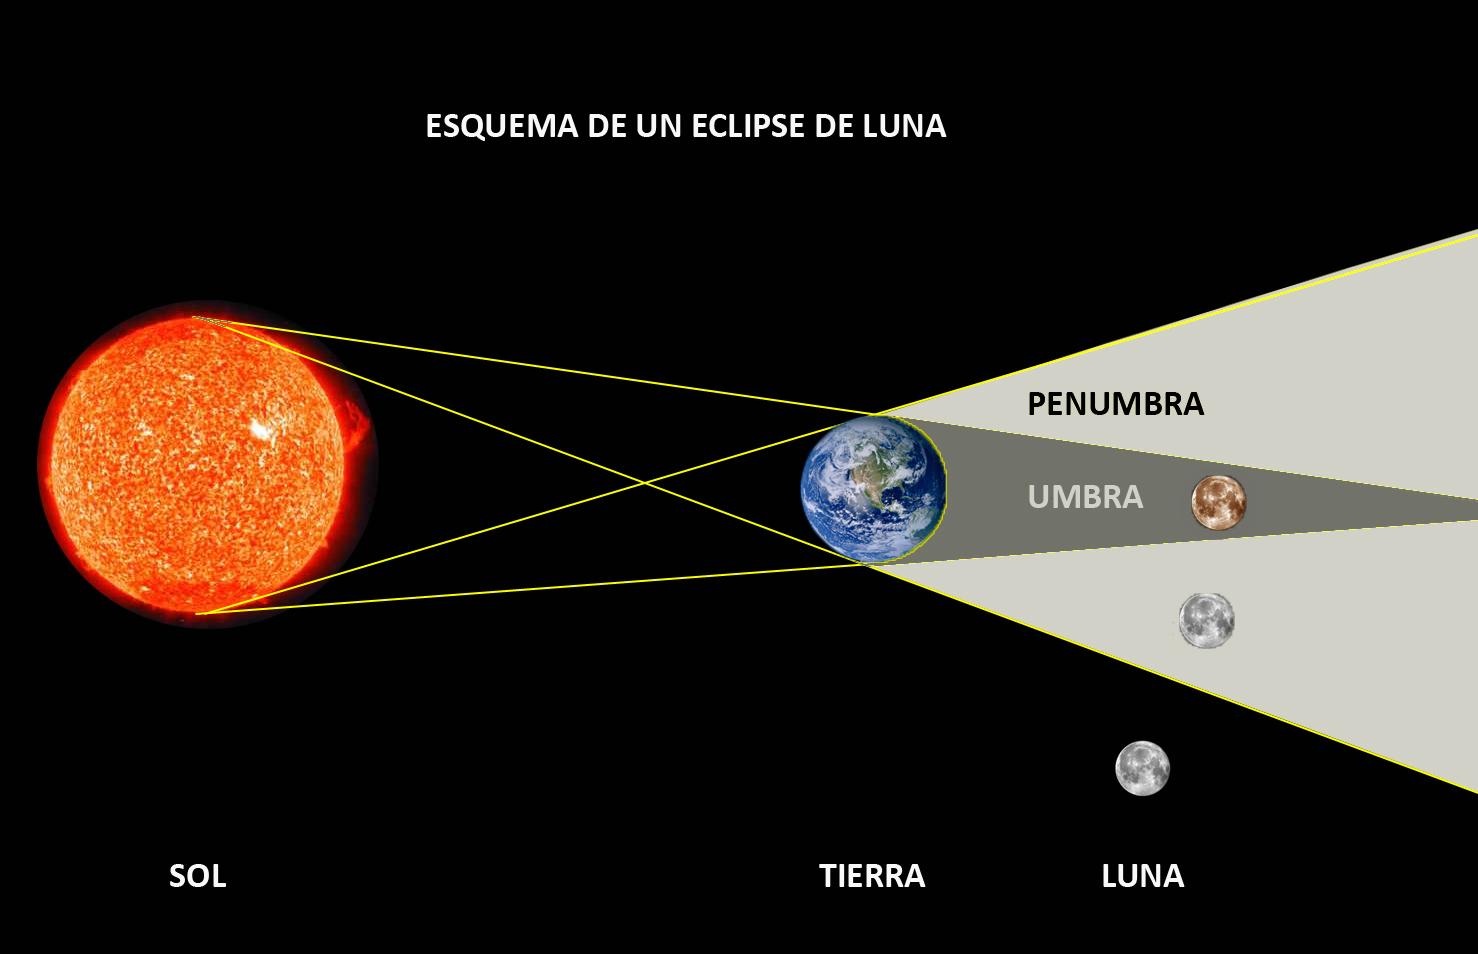 Resultado de imagen de esquema eclipse lunar